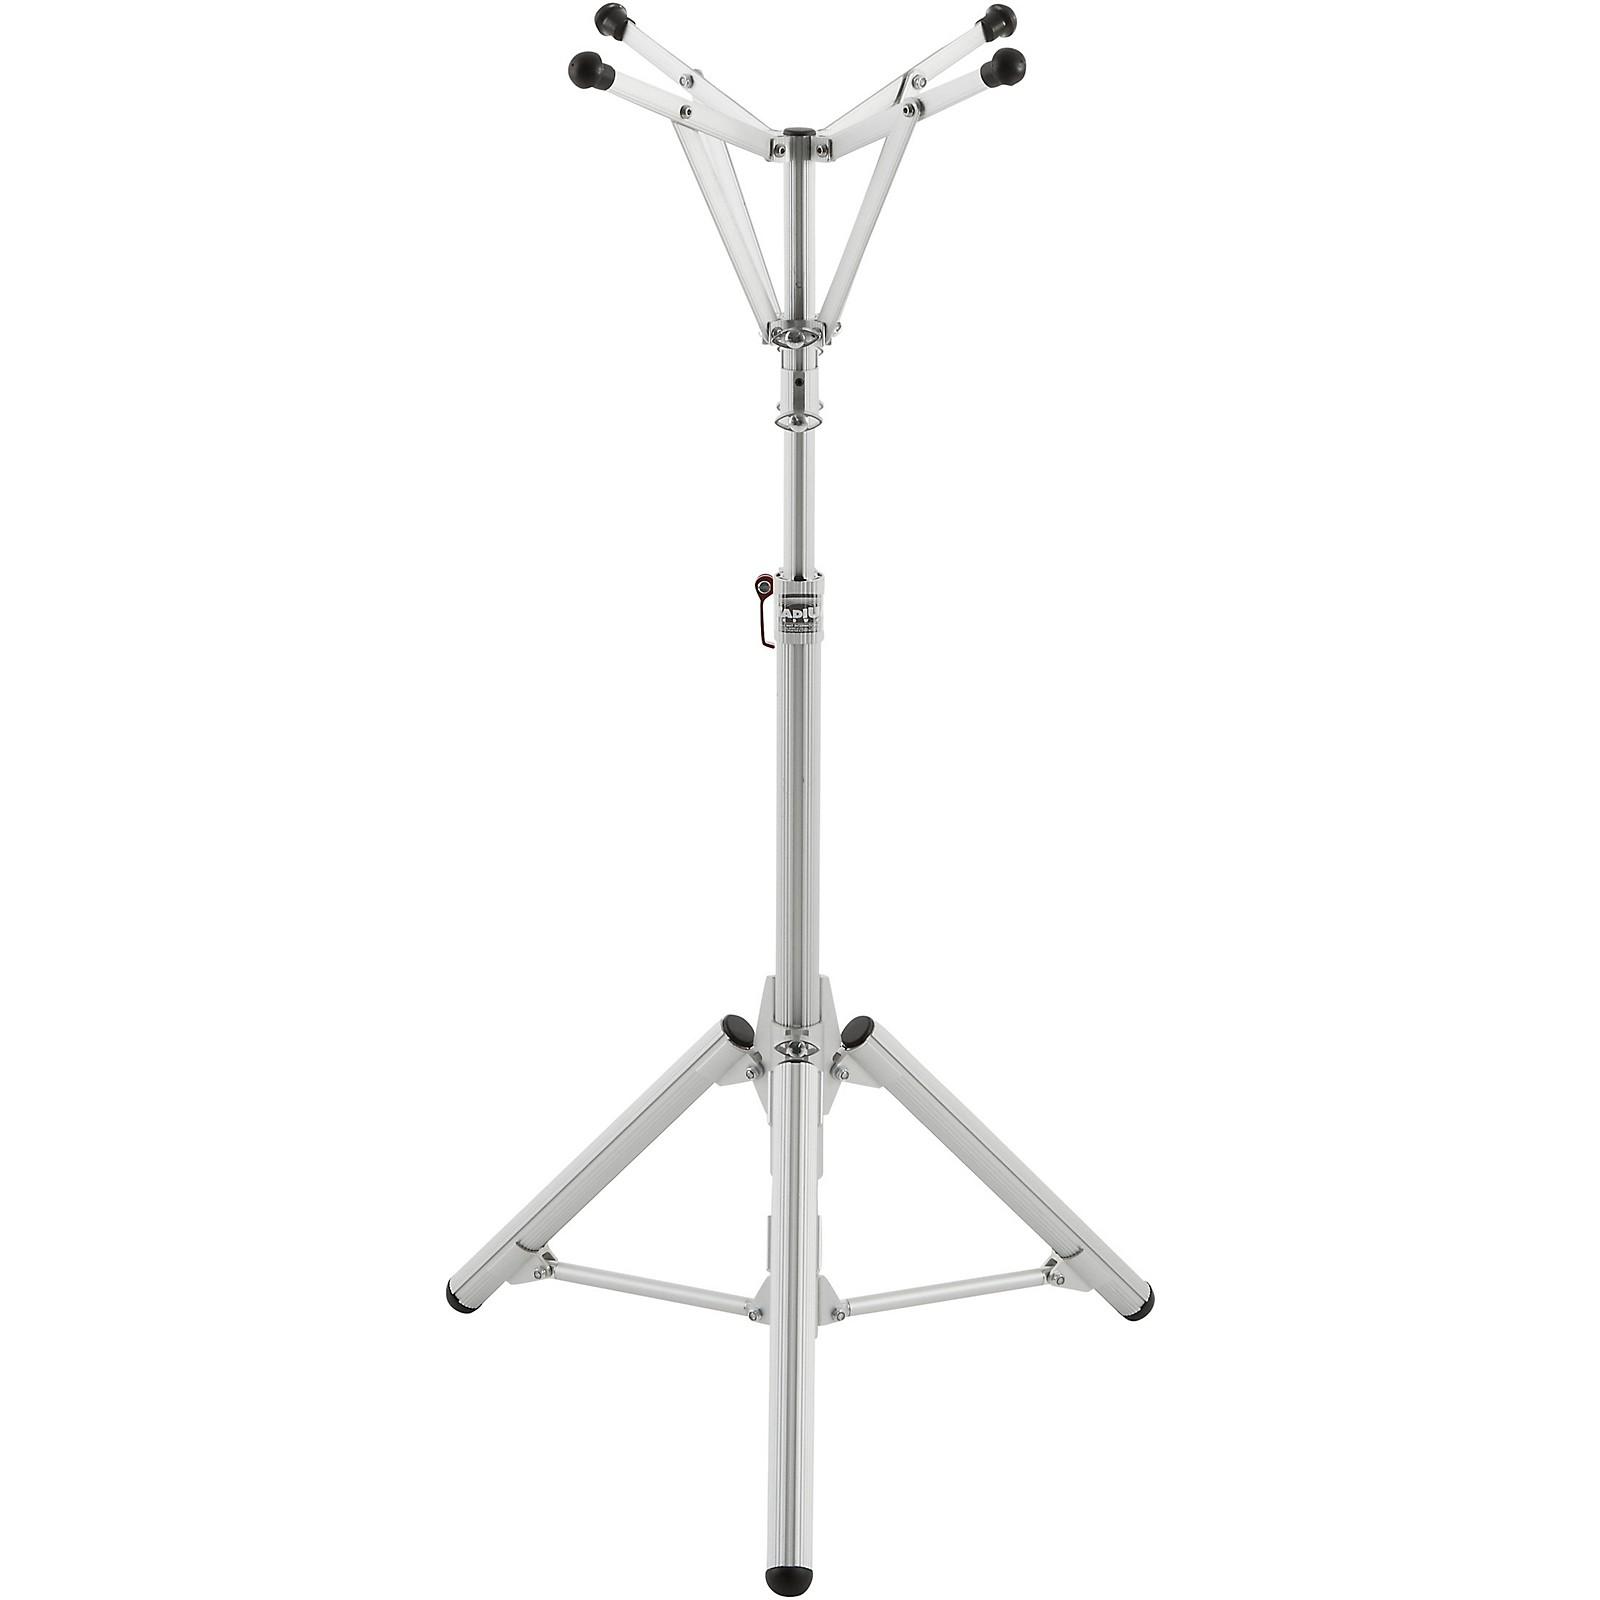 Yamaha RM-SHBA-MR Modular AIRlift Stadium Hardware Marching Stand for Bass